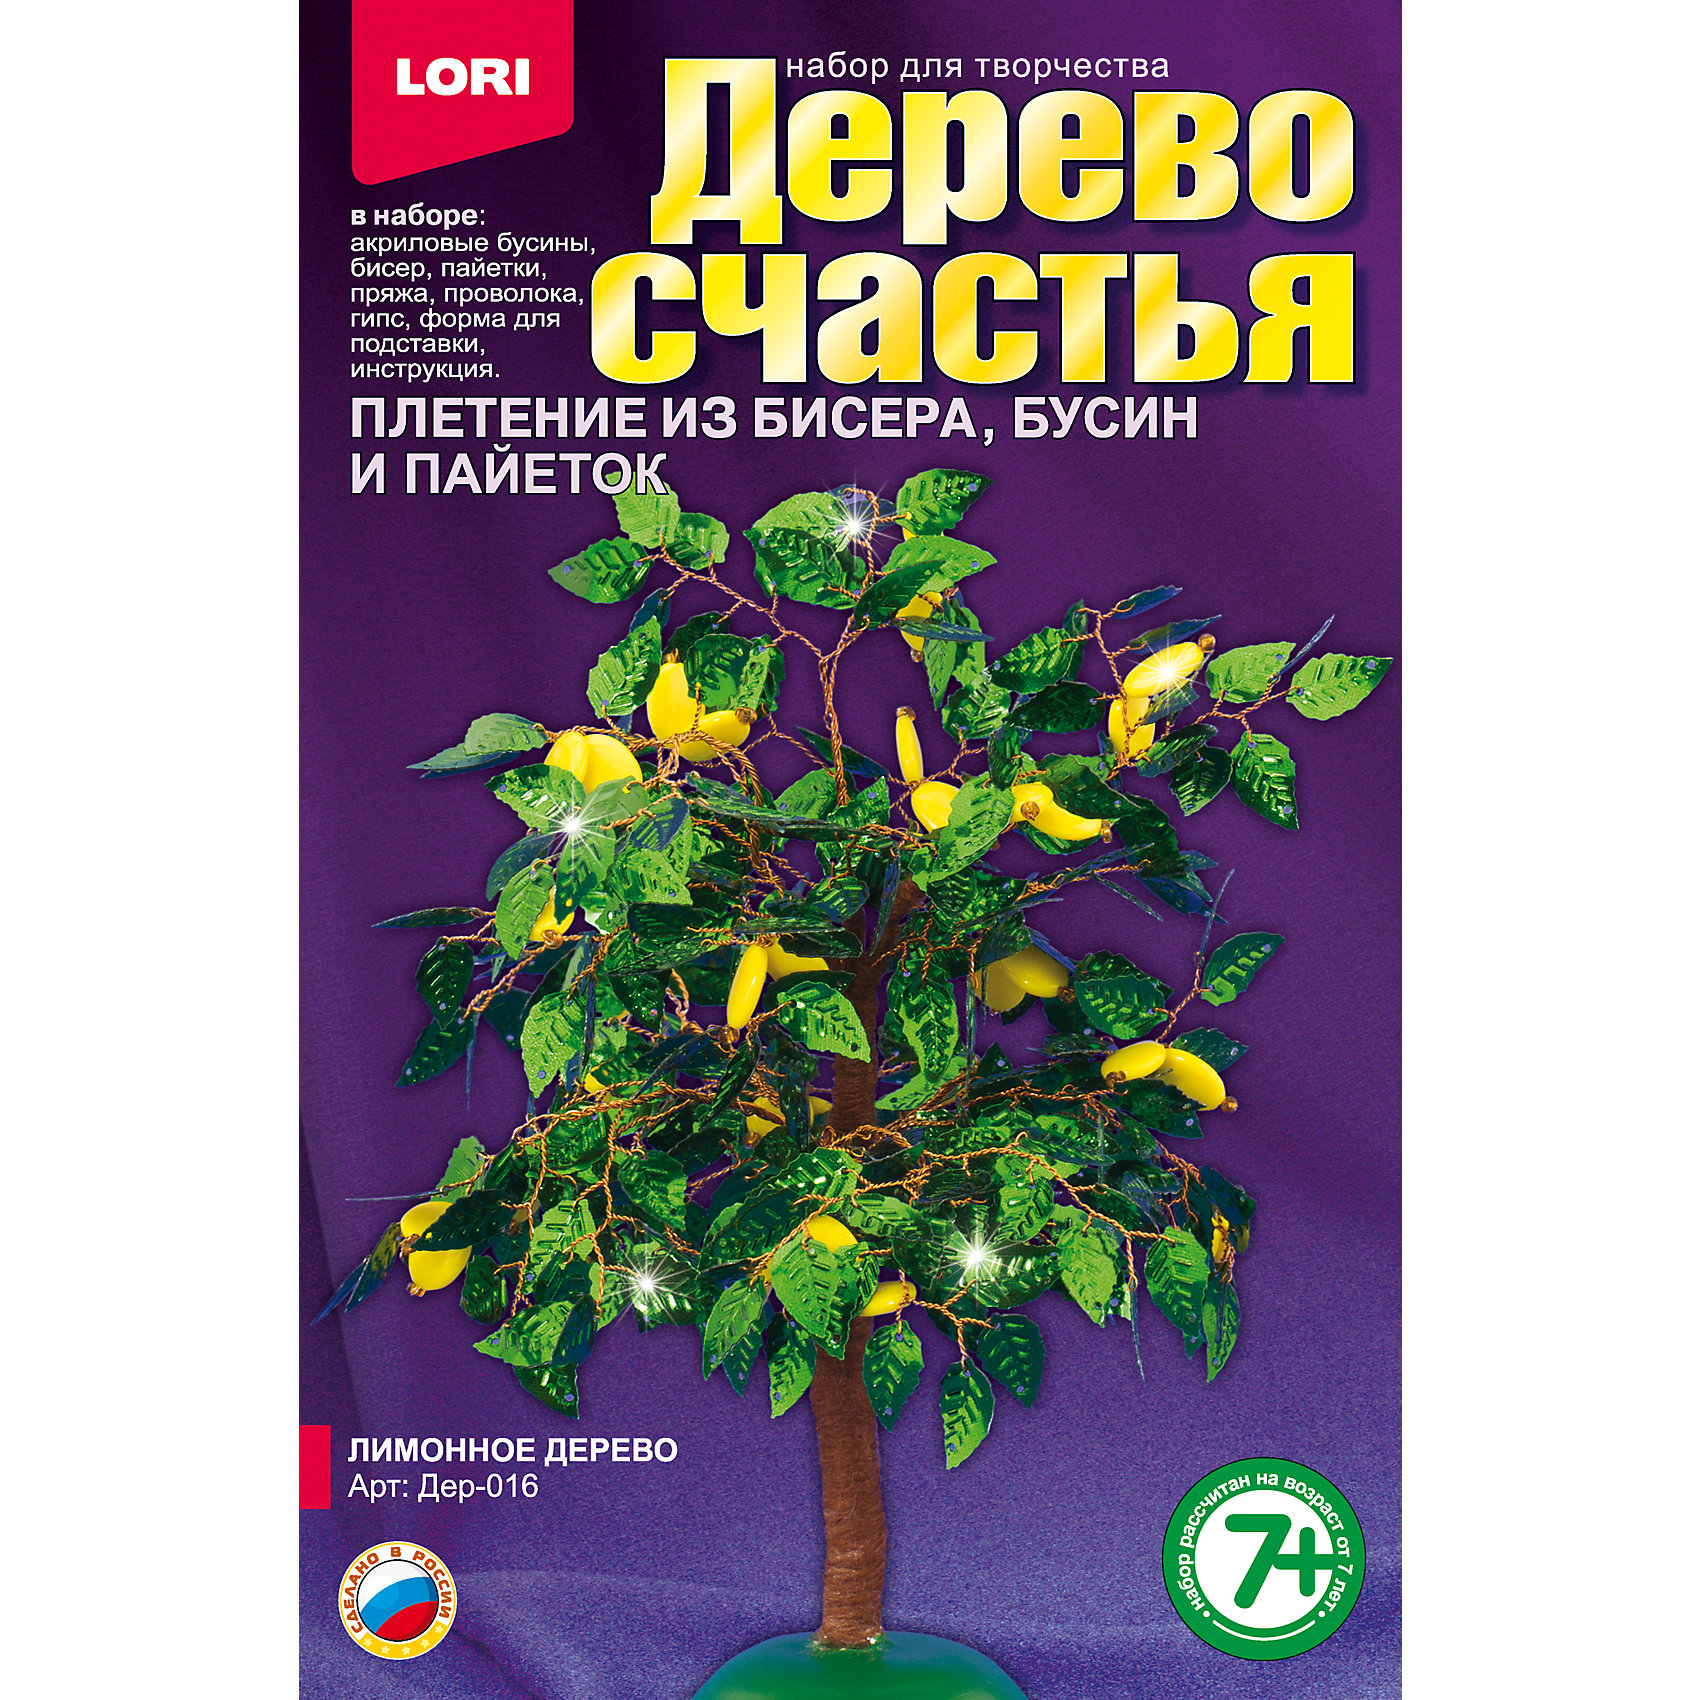 LORI Дерево счастья Лимонное дерево lori магниты из гипса золушка lori